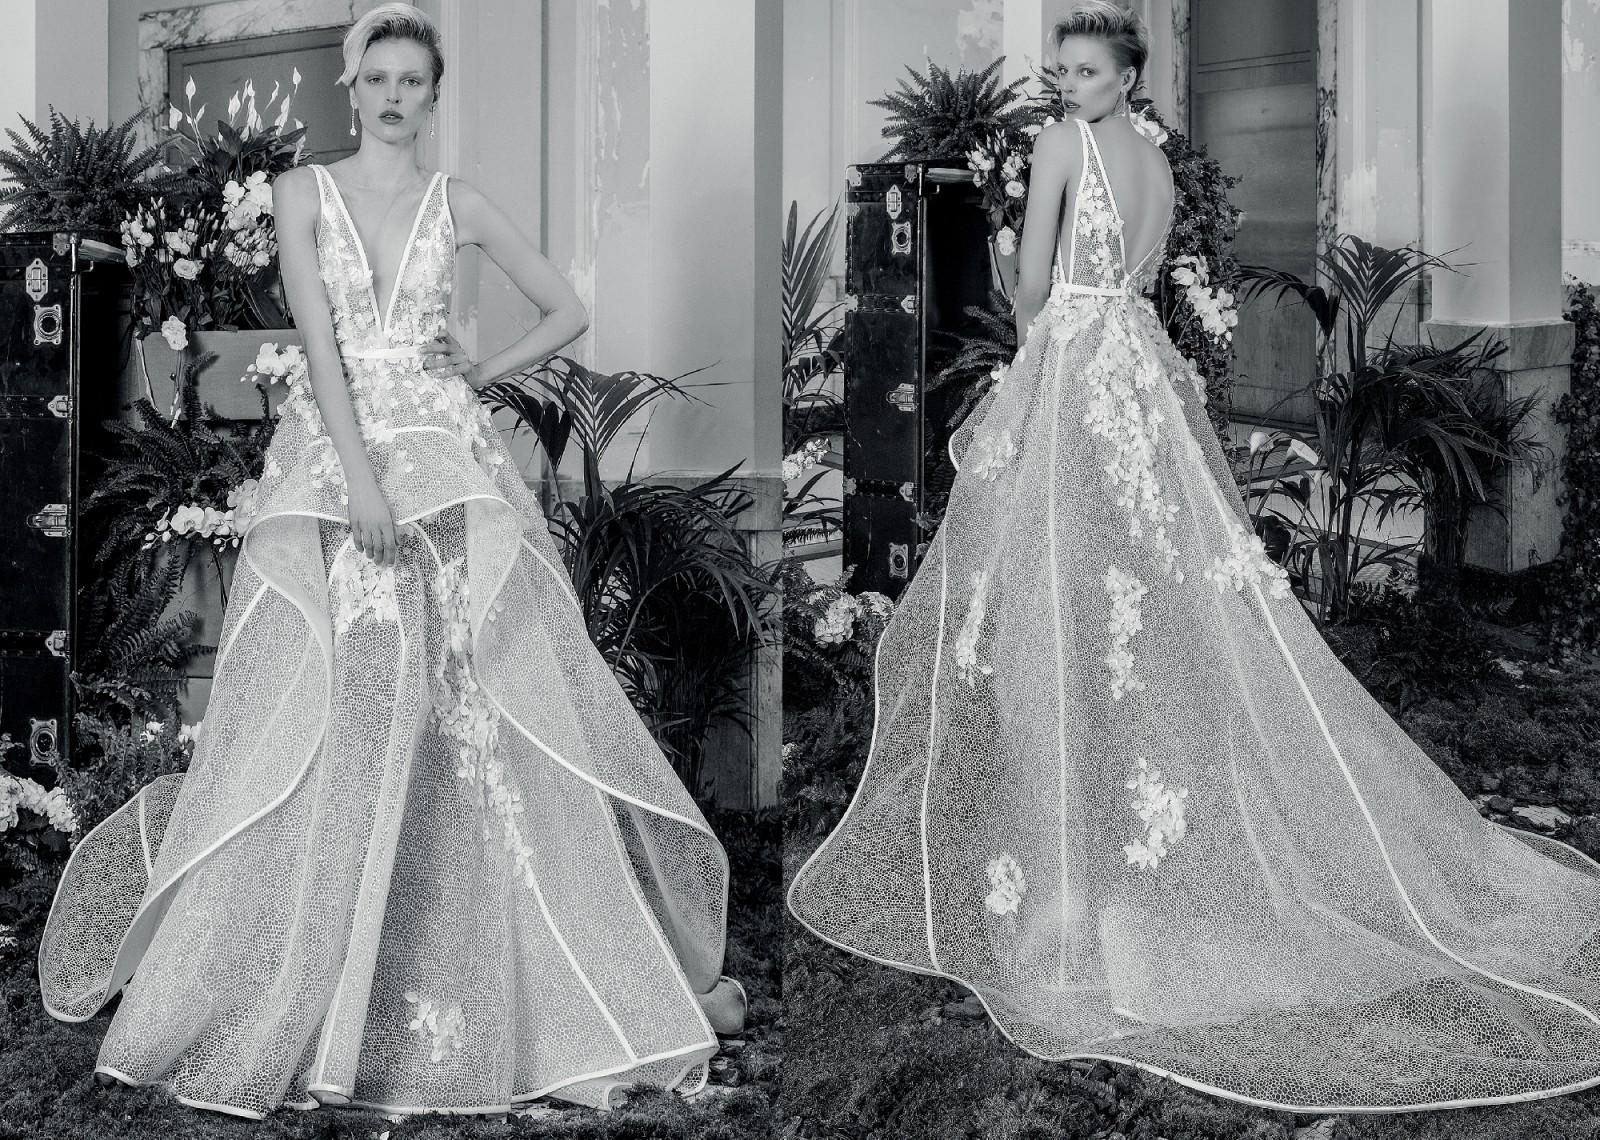 new concept 23c8b b6234 Valentini Spose Valentini Couture by J'Aton V1108 IDEA Wedding Dress On  Sale - 40% Off